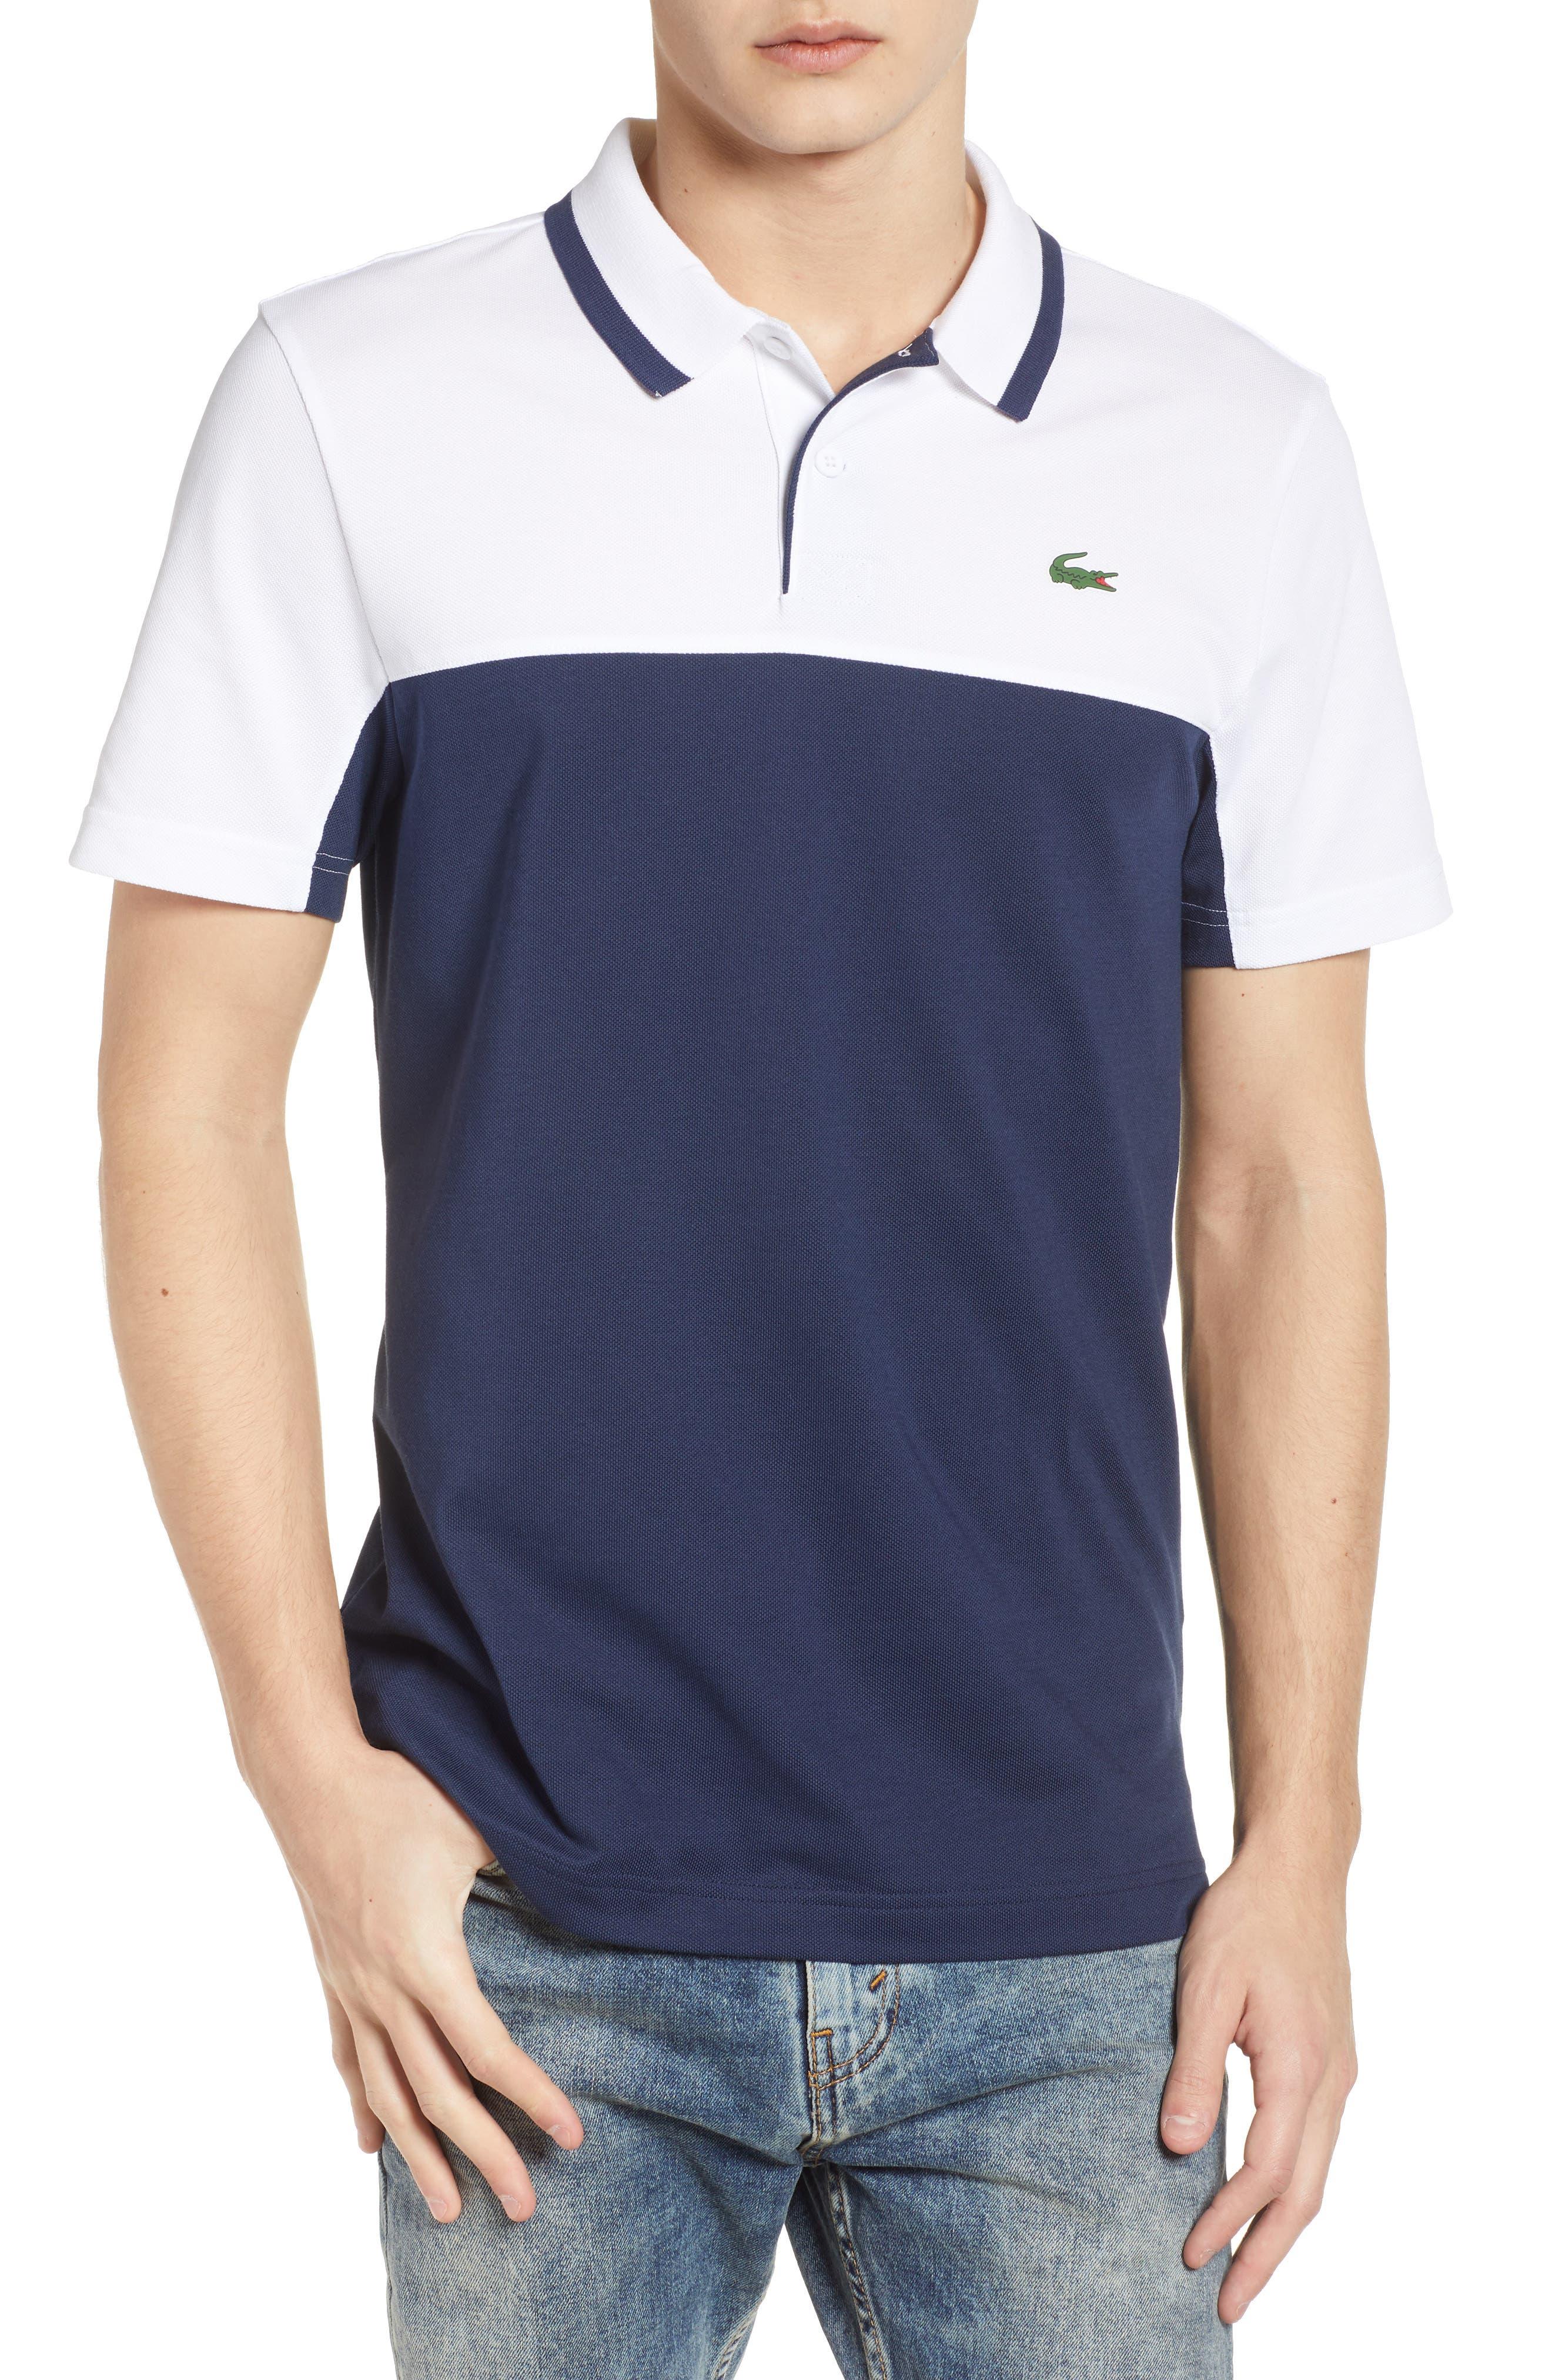 Piqué Cotton Blend Polo,                         Main,                         color, White/ Navy Blue